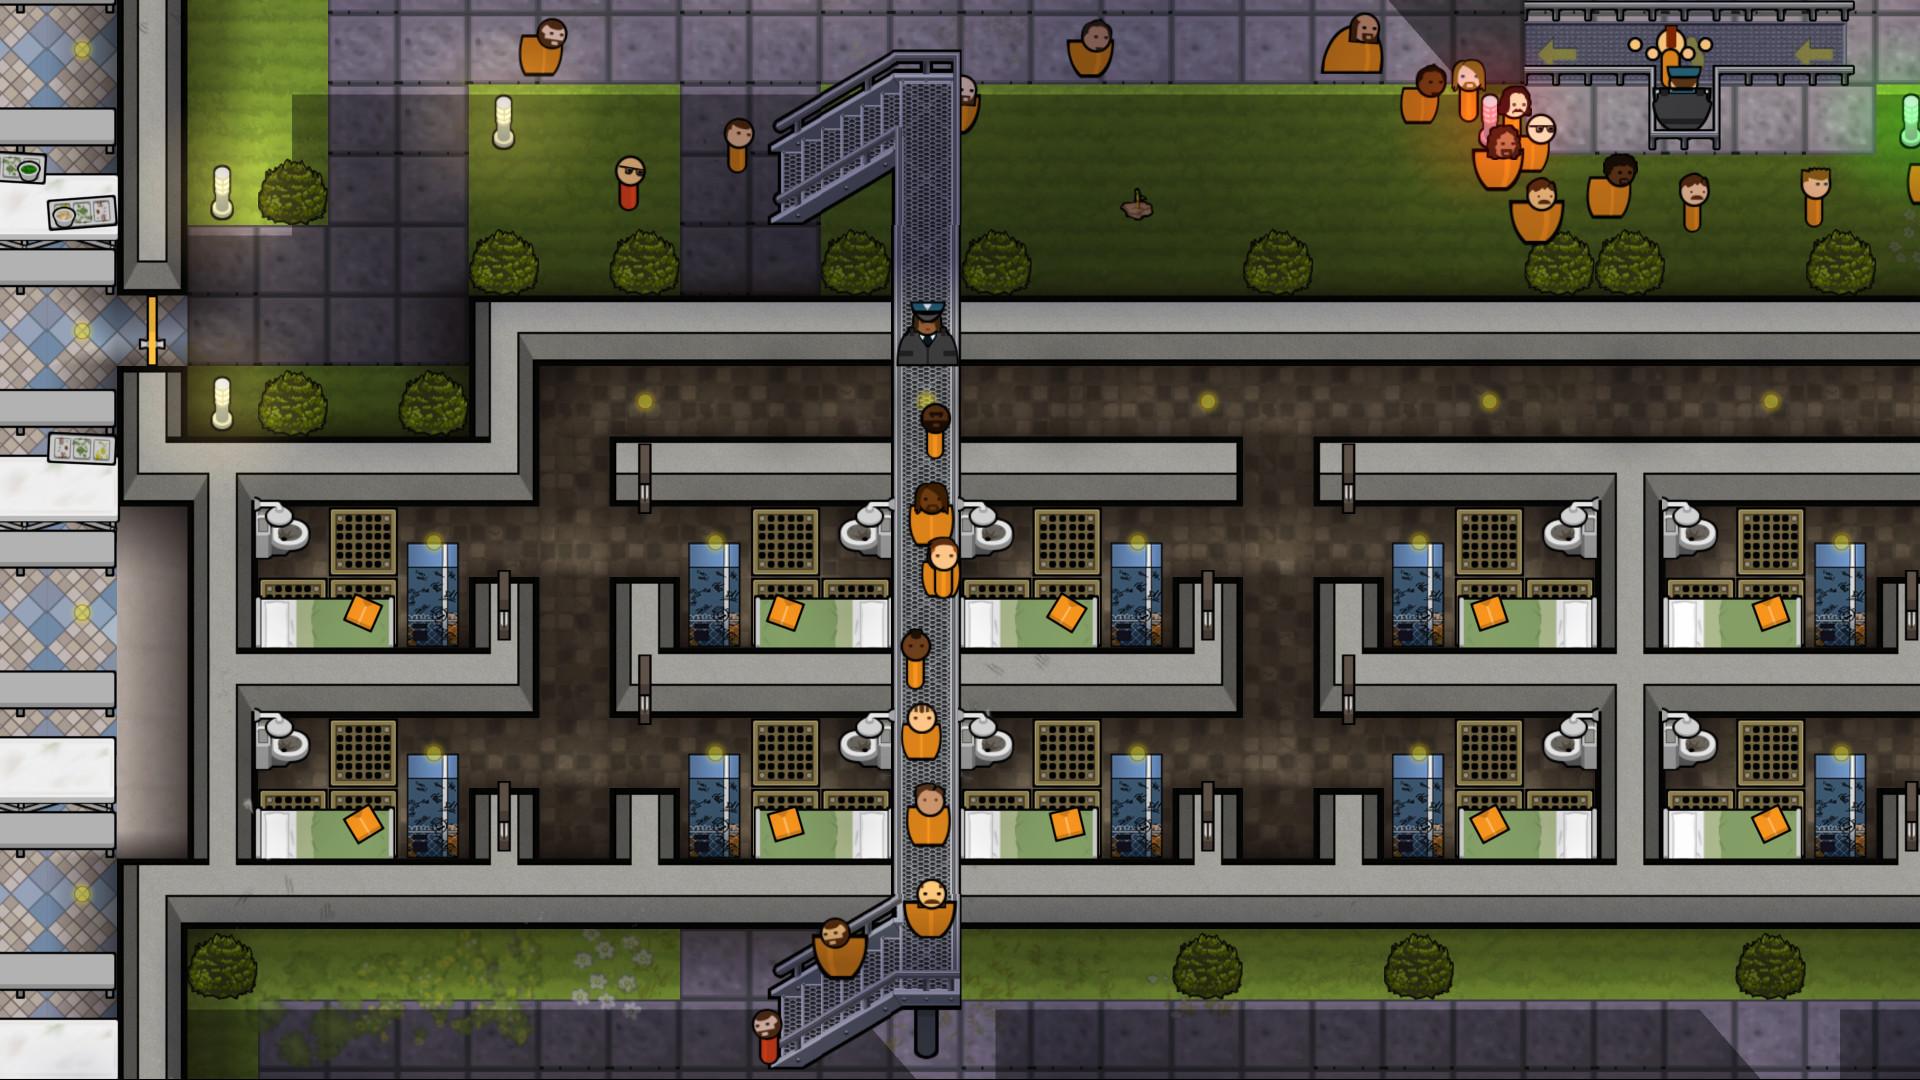 prison-architect-kisa-sureligine-ucretsiz-oldu